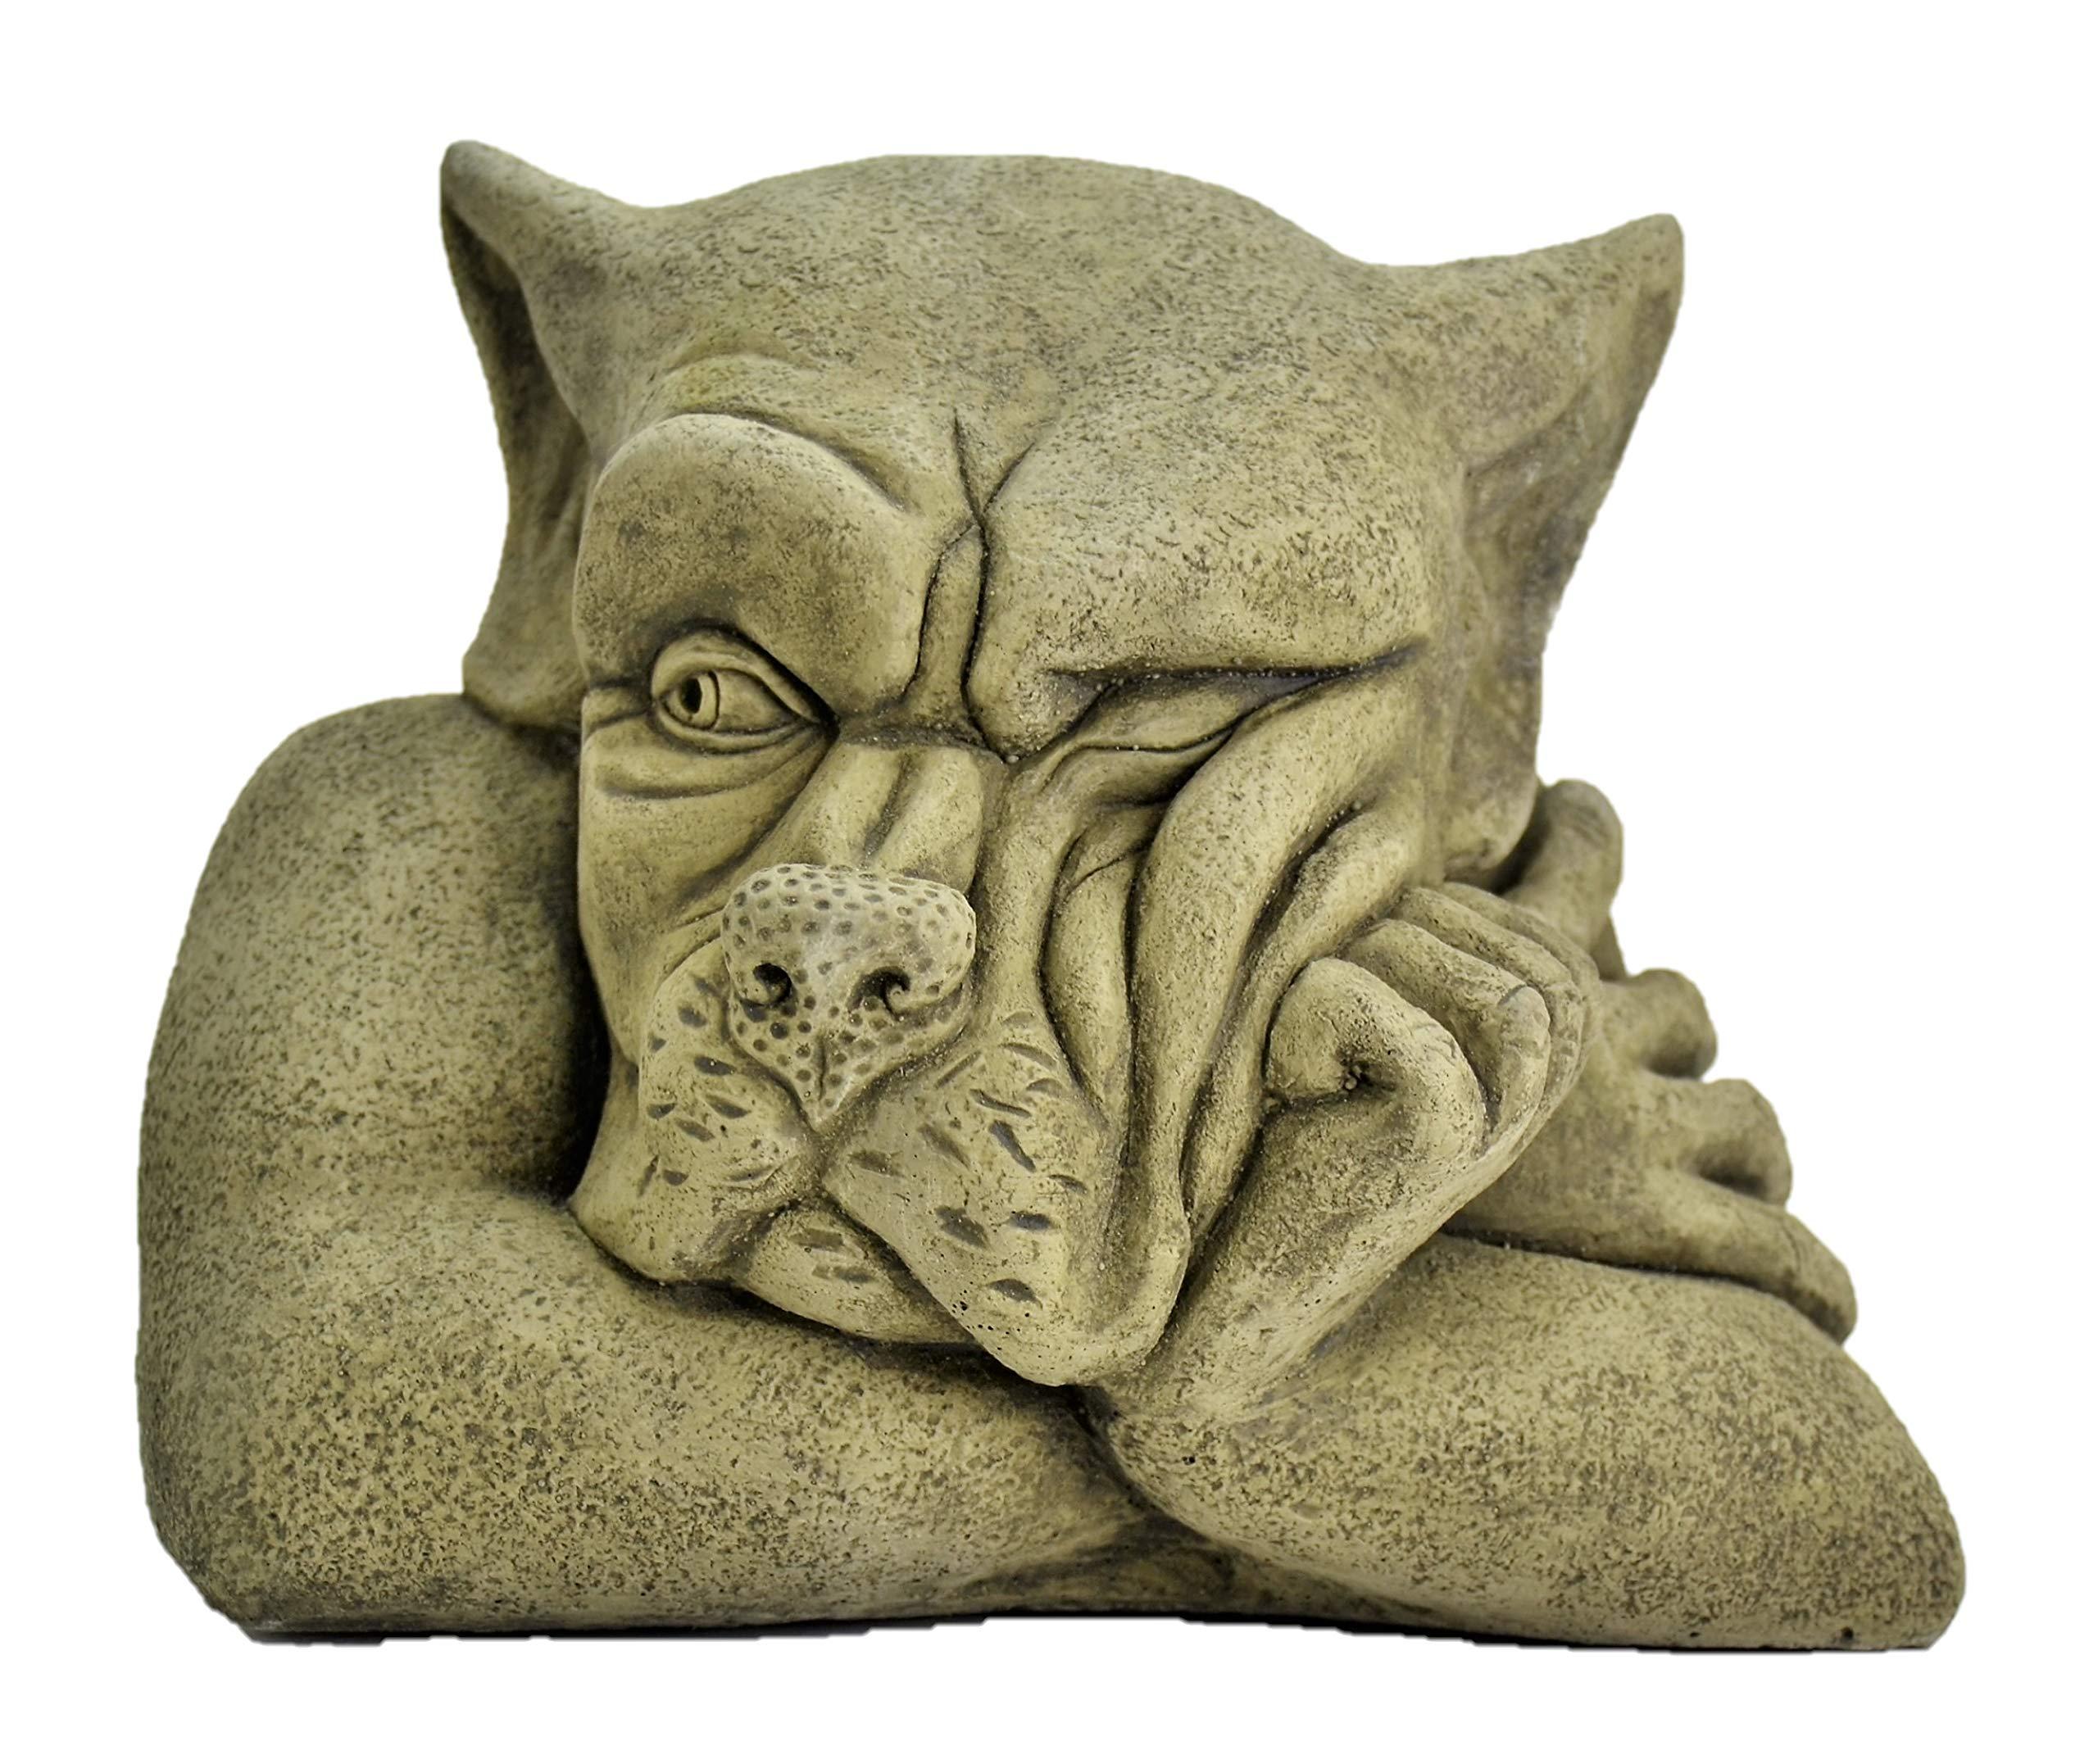 DSL Bert-Garden Ornament-Gargoyle-Sculpture Stone Statue-Home Patio-Decorative Gift